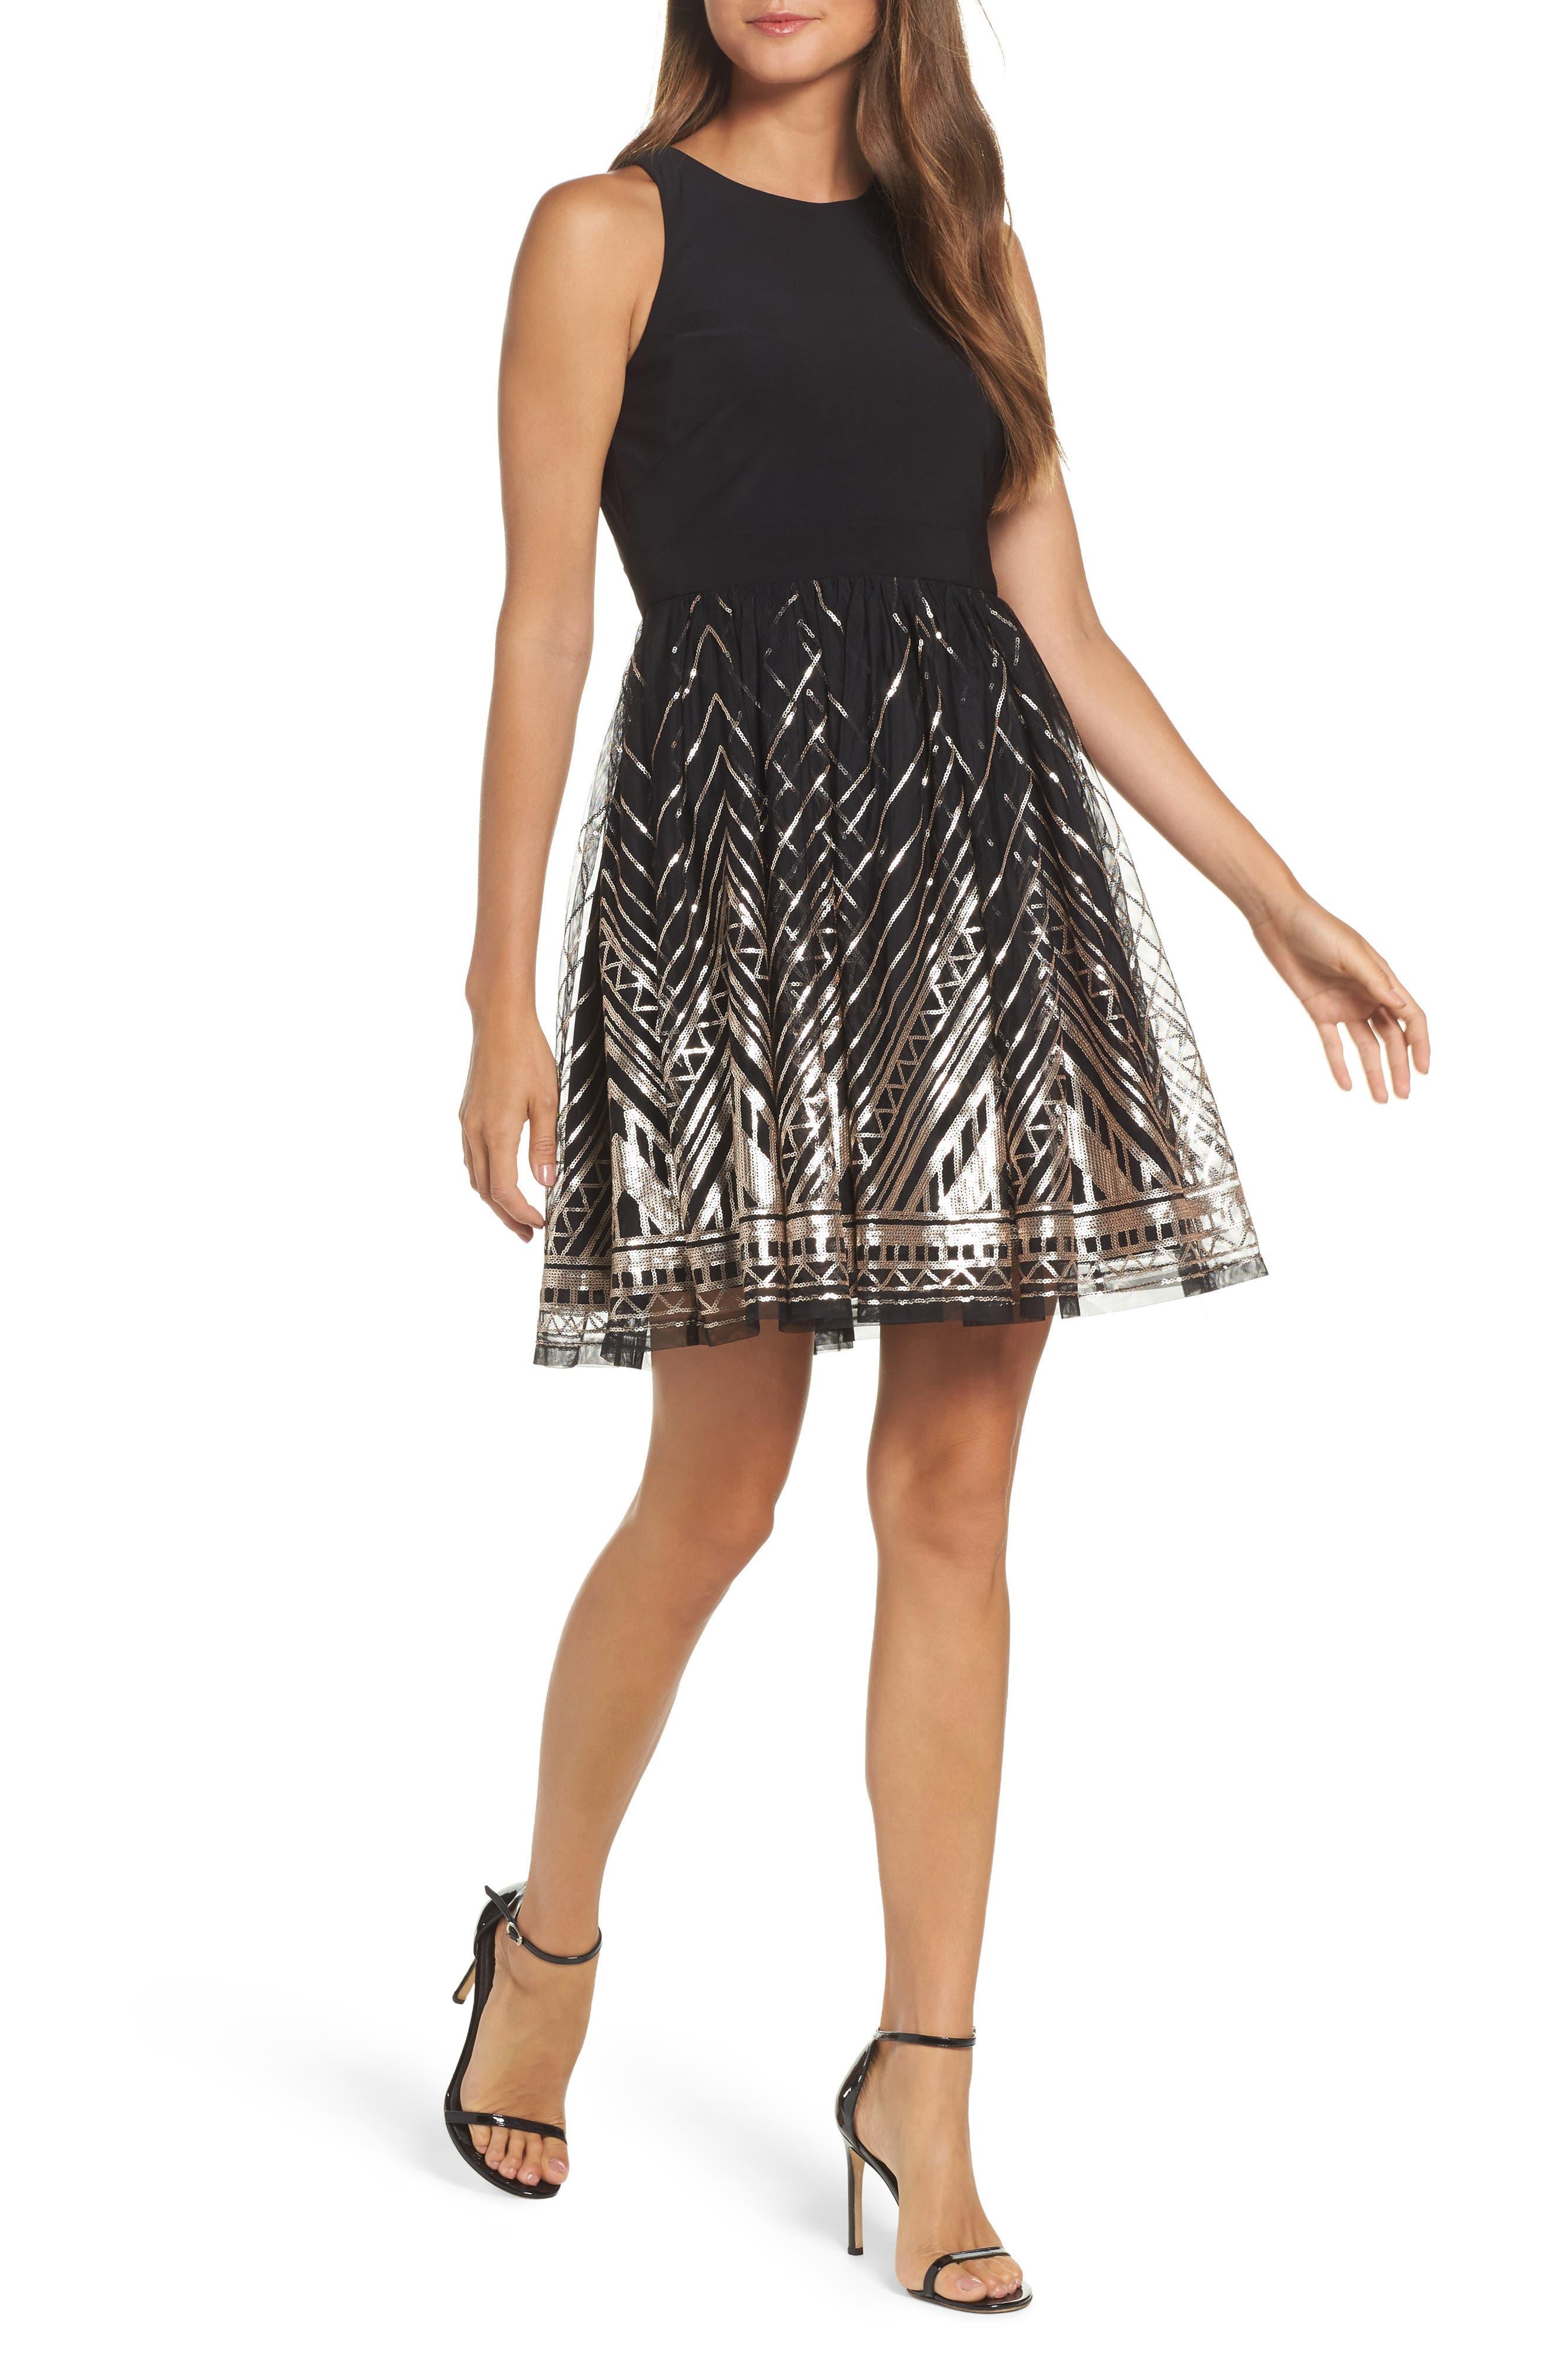 Petite Vince Camuto Sequin Fit & Flare Cocktail Dress, Black